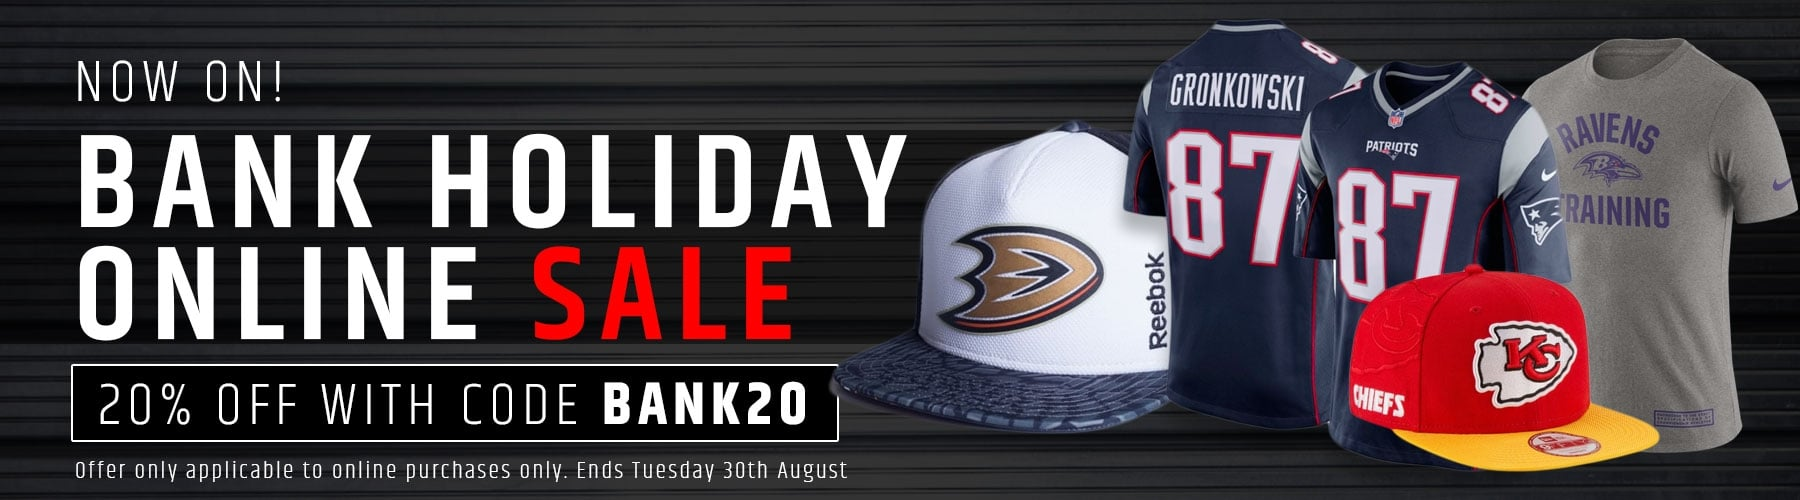 Bank Holiday Sale